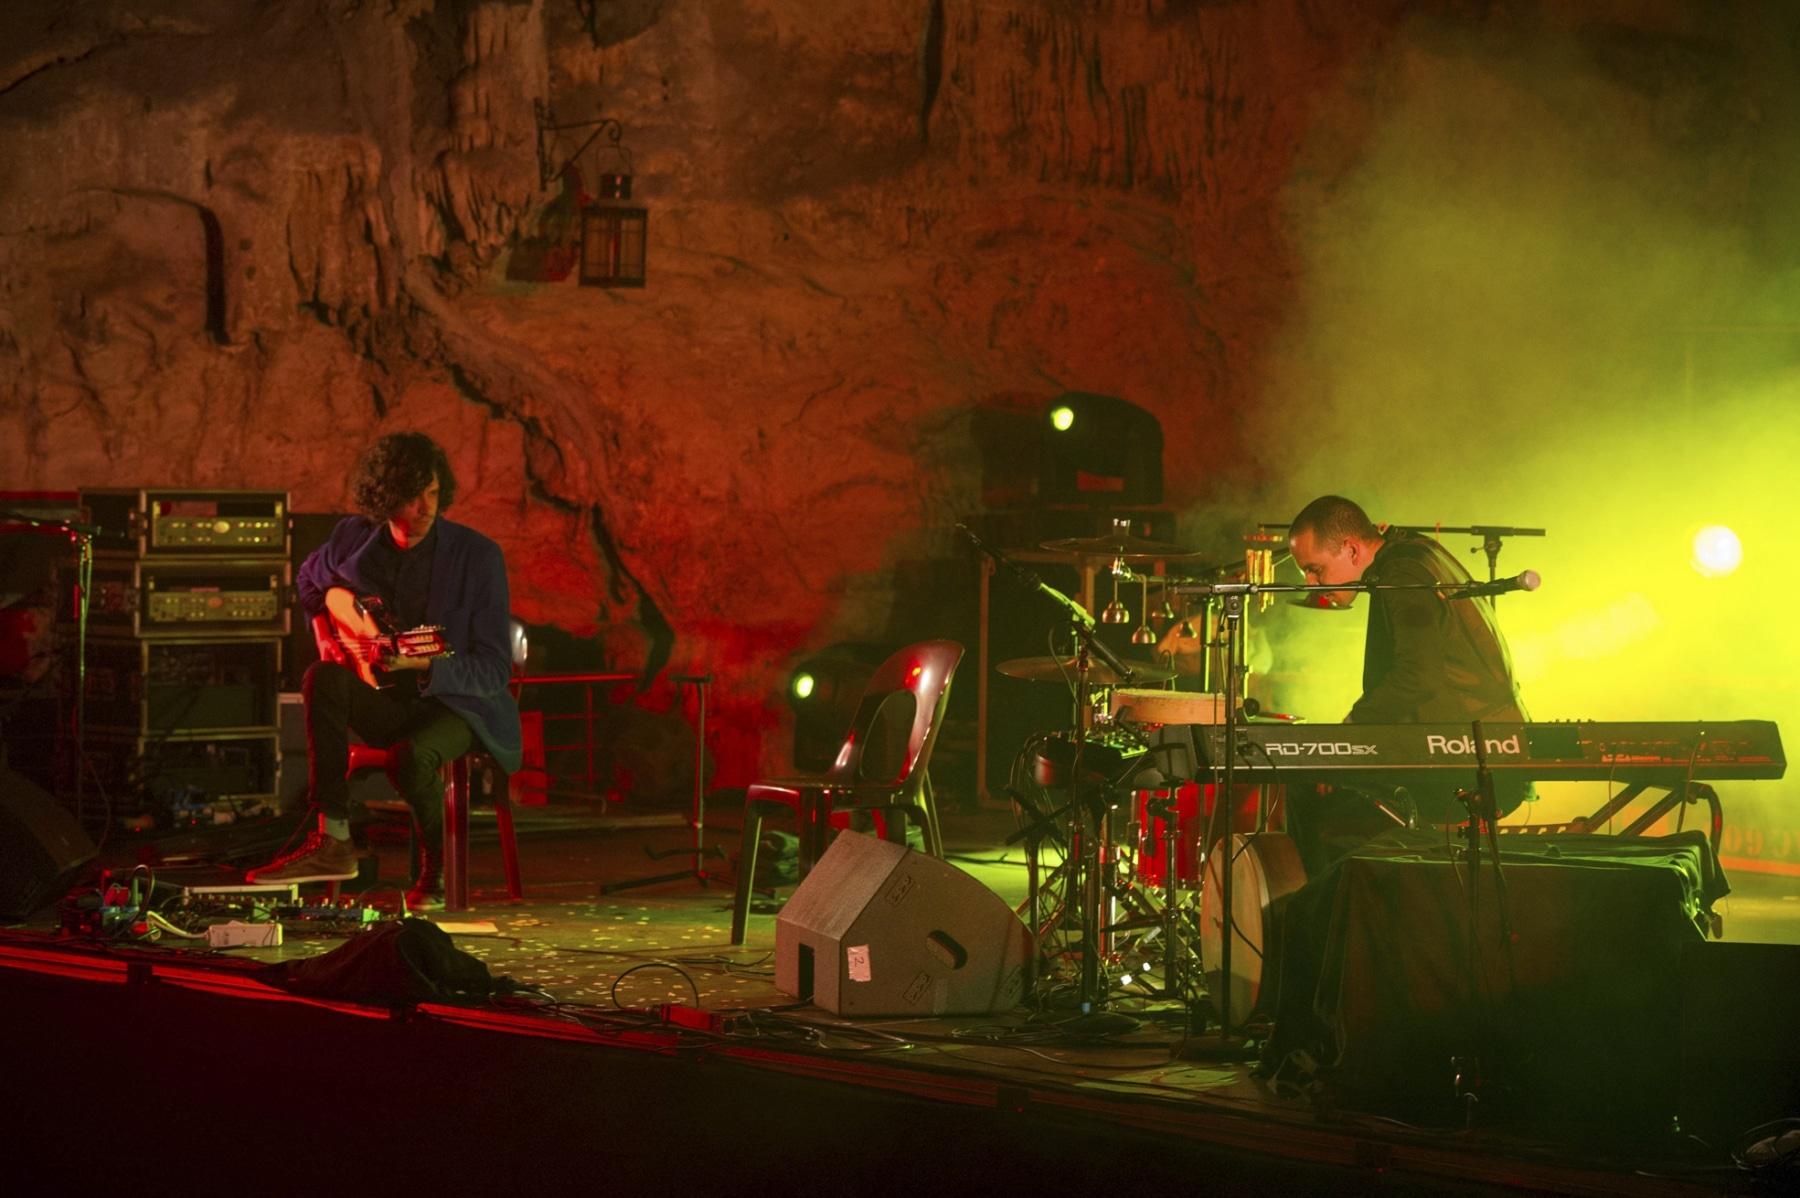 19-junio-gibraltar-world-music-festival24_14463417204_o